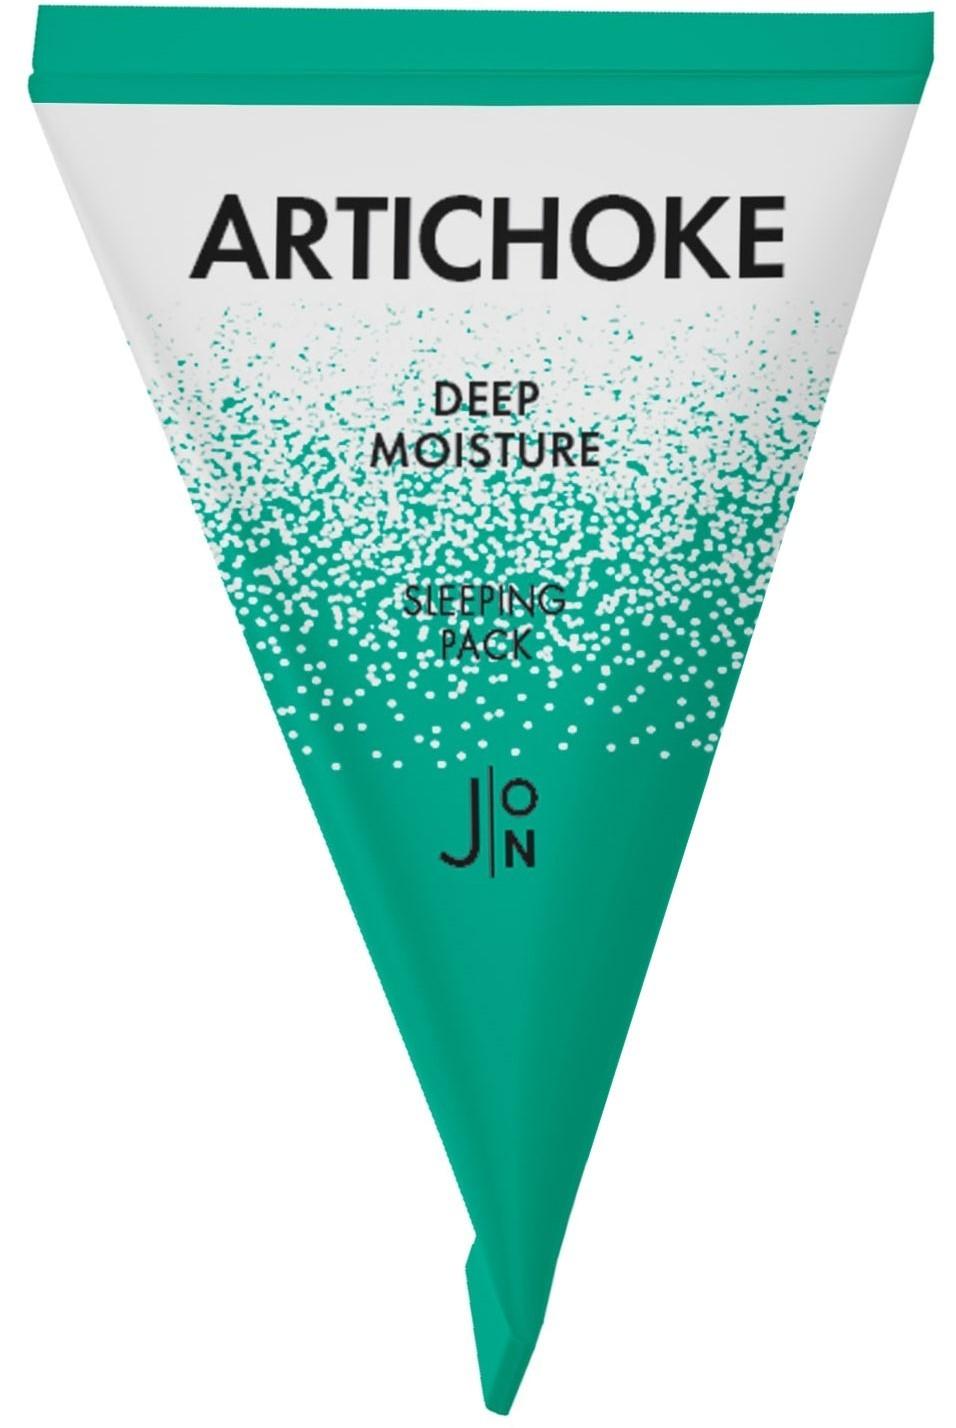 Маска ночная увлажняющая для лица с артишоком J:ON Artichoke Deep Moisture Sleeping Pack  2 - Фото 2